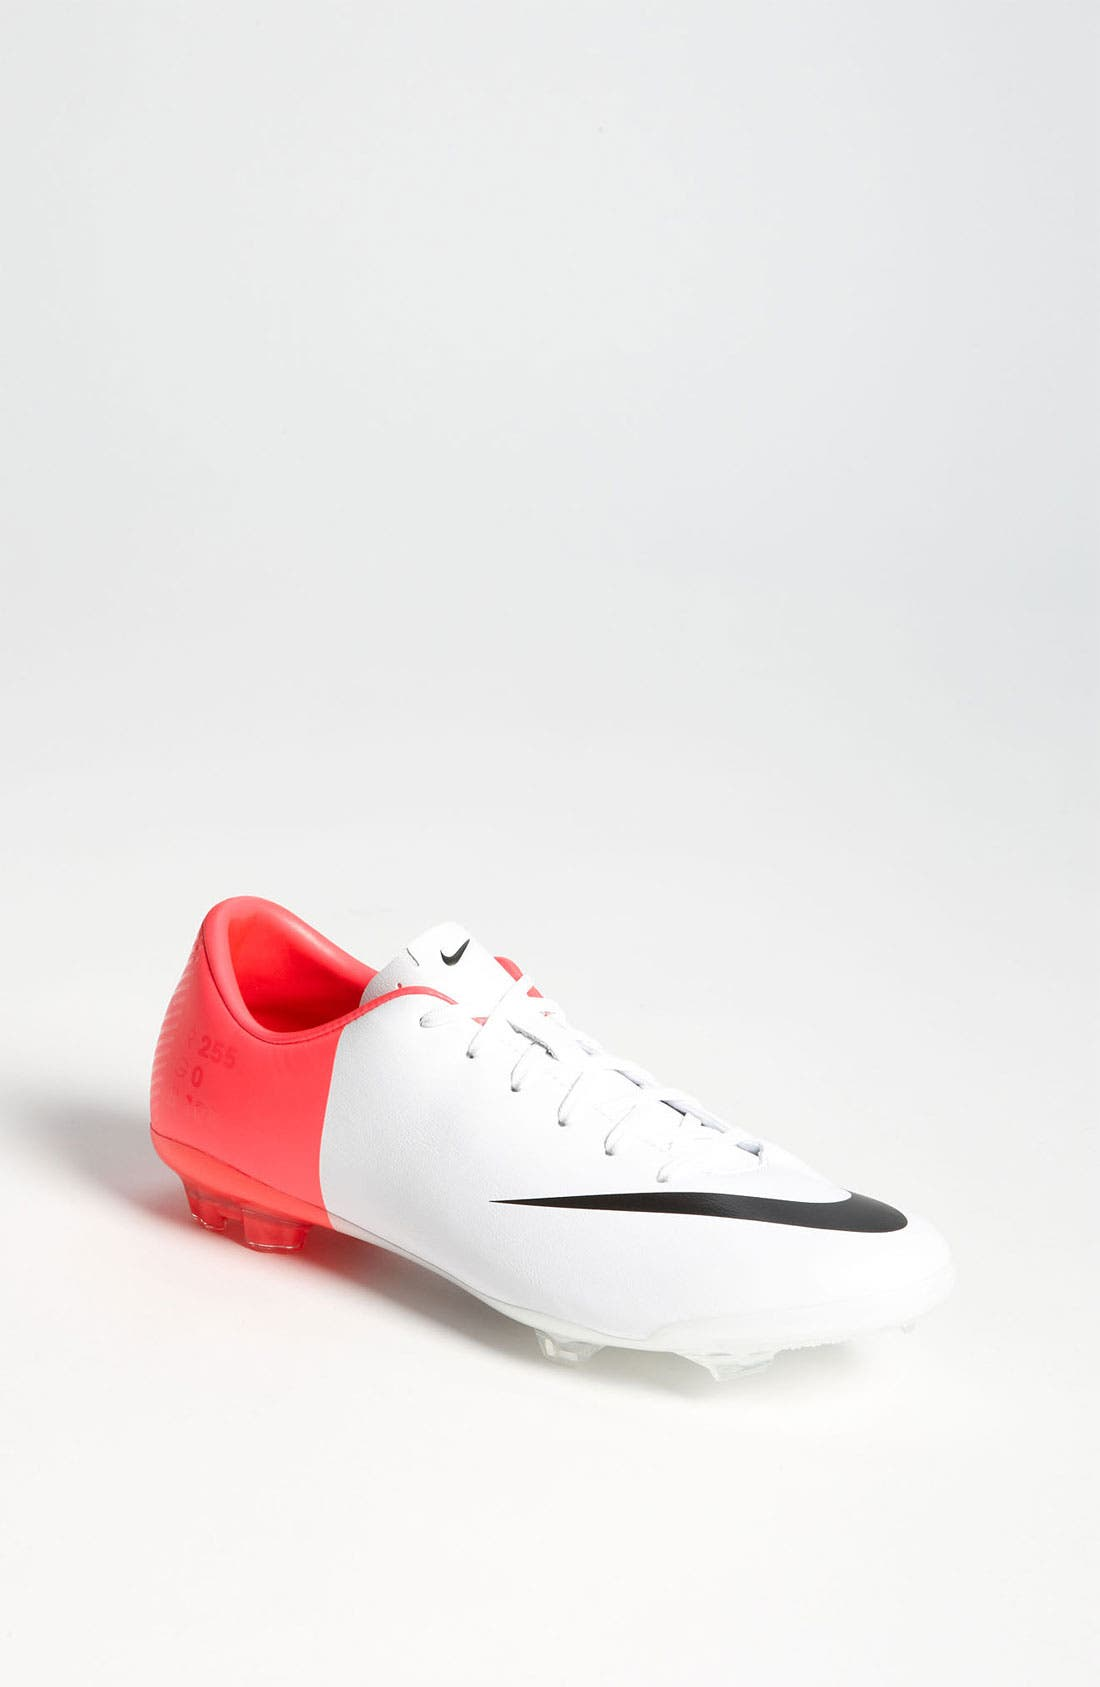 Alternate Image 1 Selected - Nike 'Mercurial Vapor VIII' Soccer Shoe (Little Kid & Big Kid)